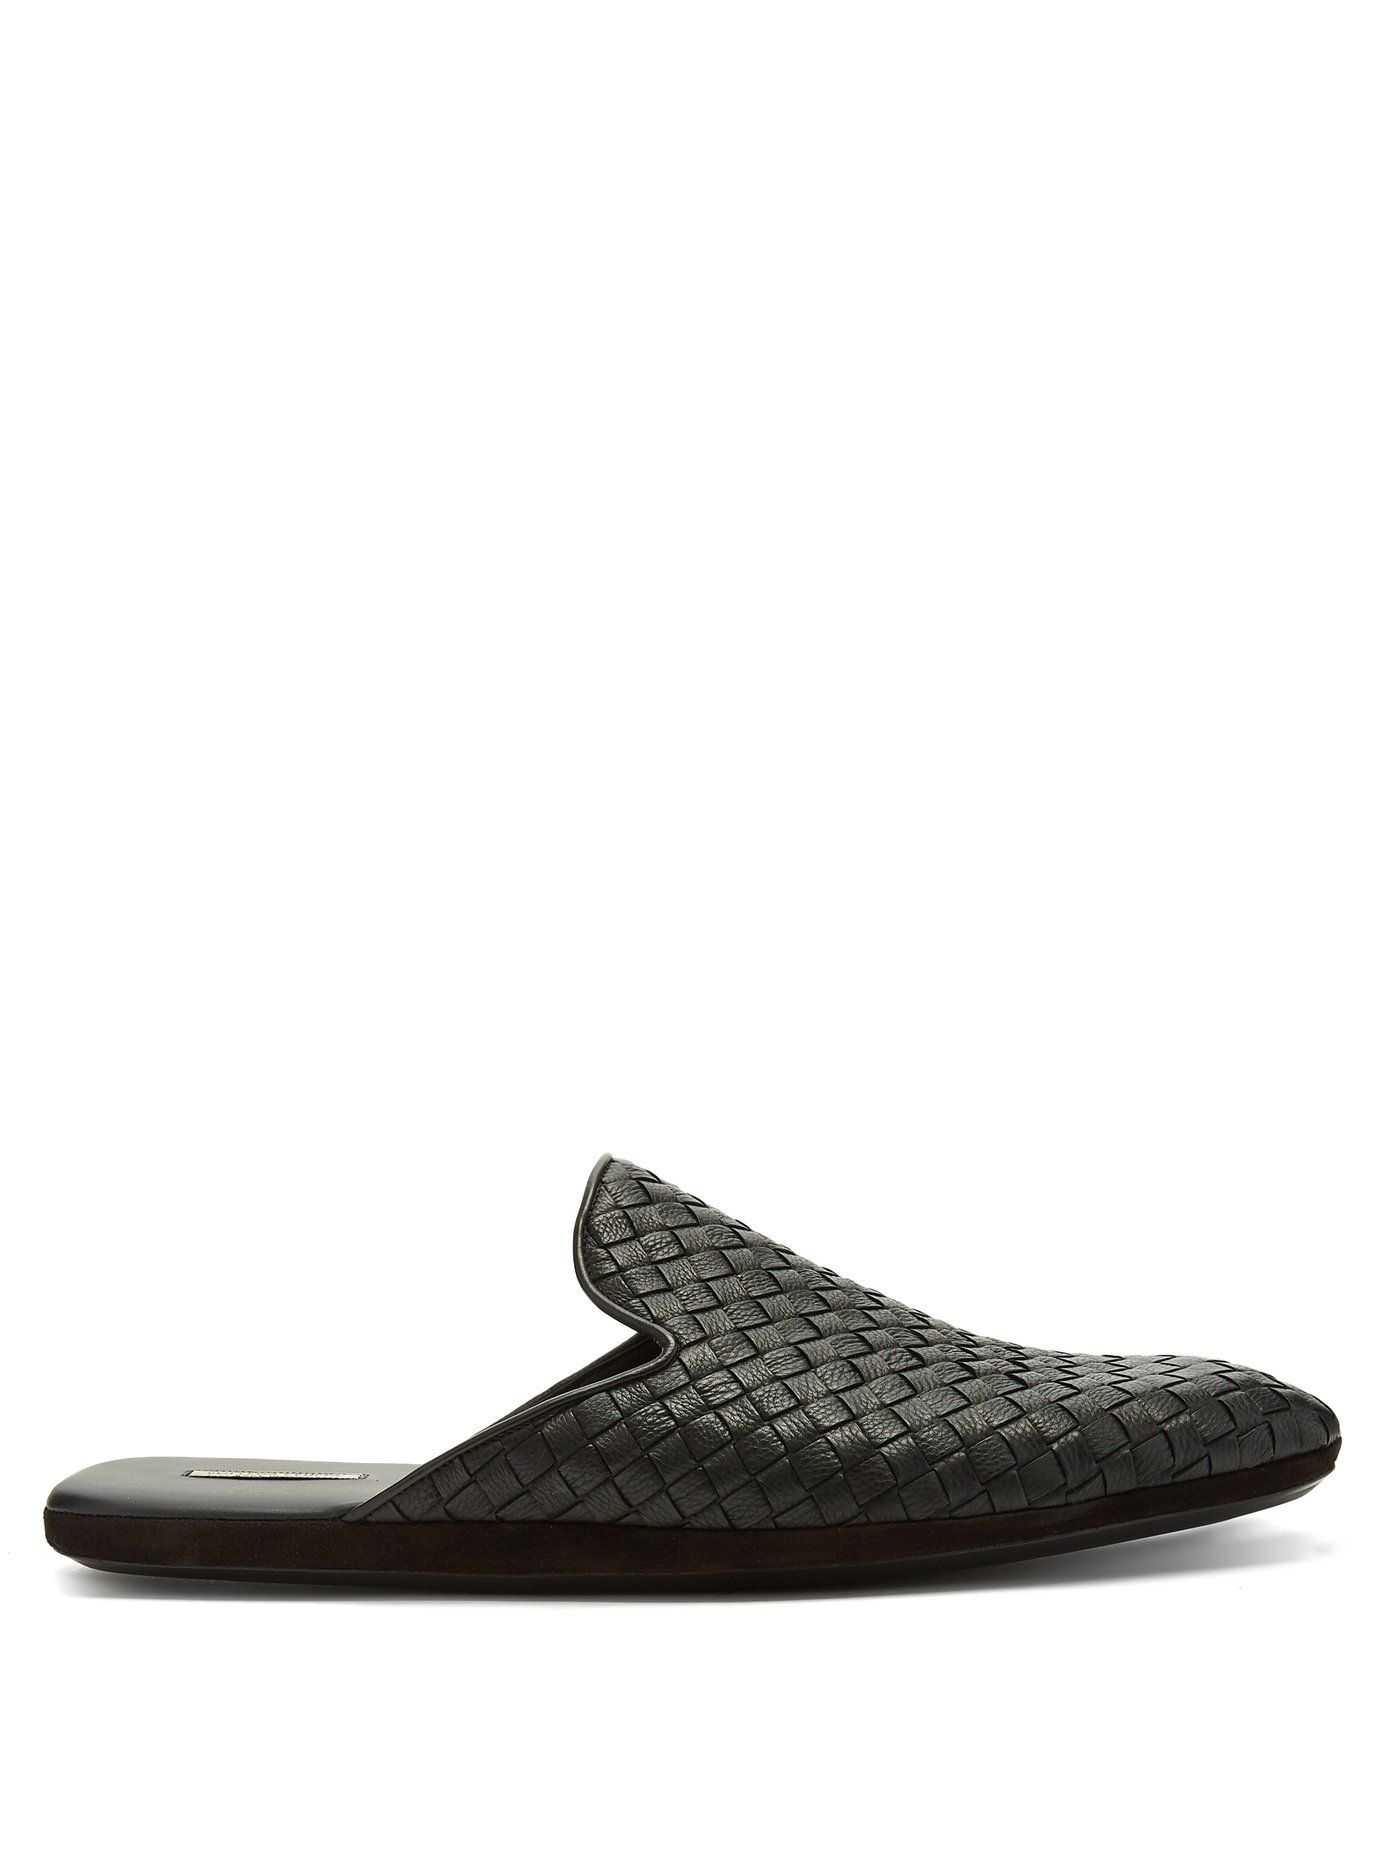 902fd5f0936d0 Bottega Veneta Intrecciato leather slipper shoes | Shoes | Leather ...